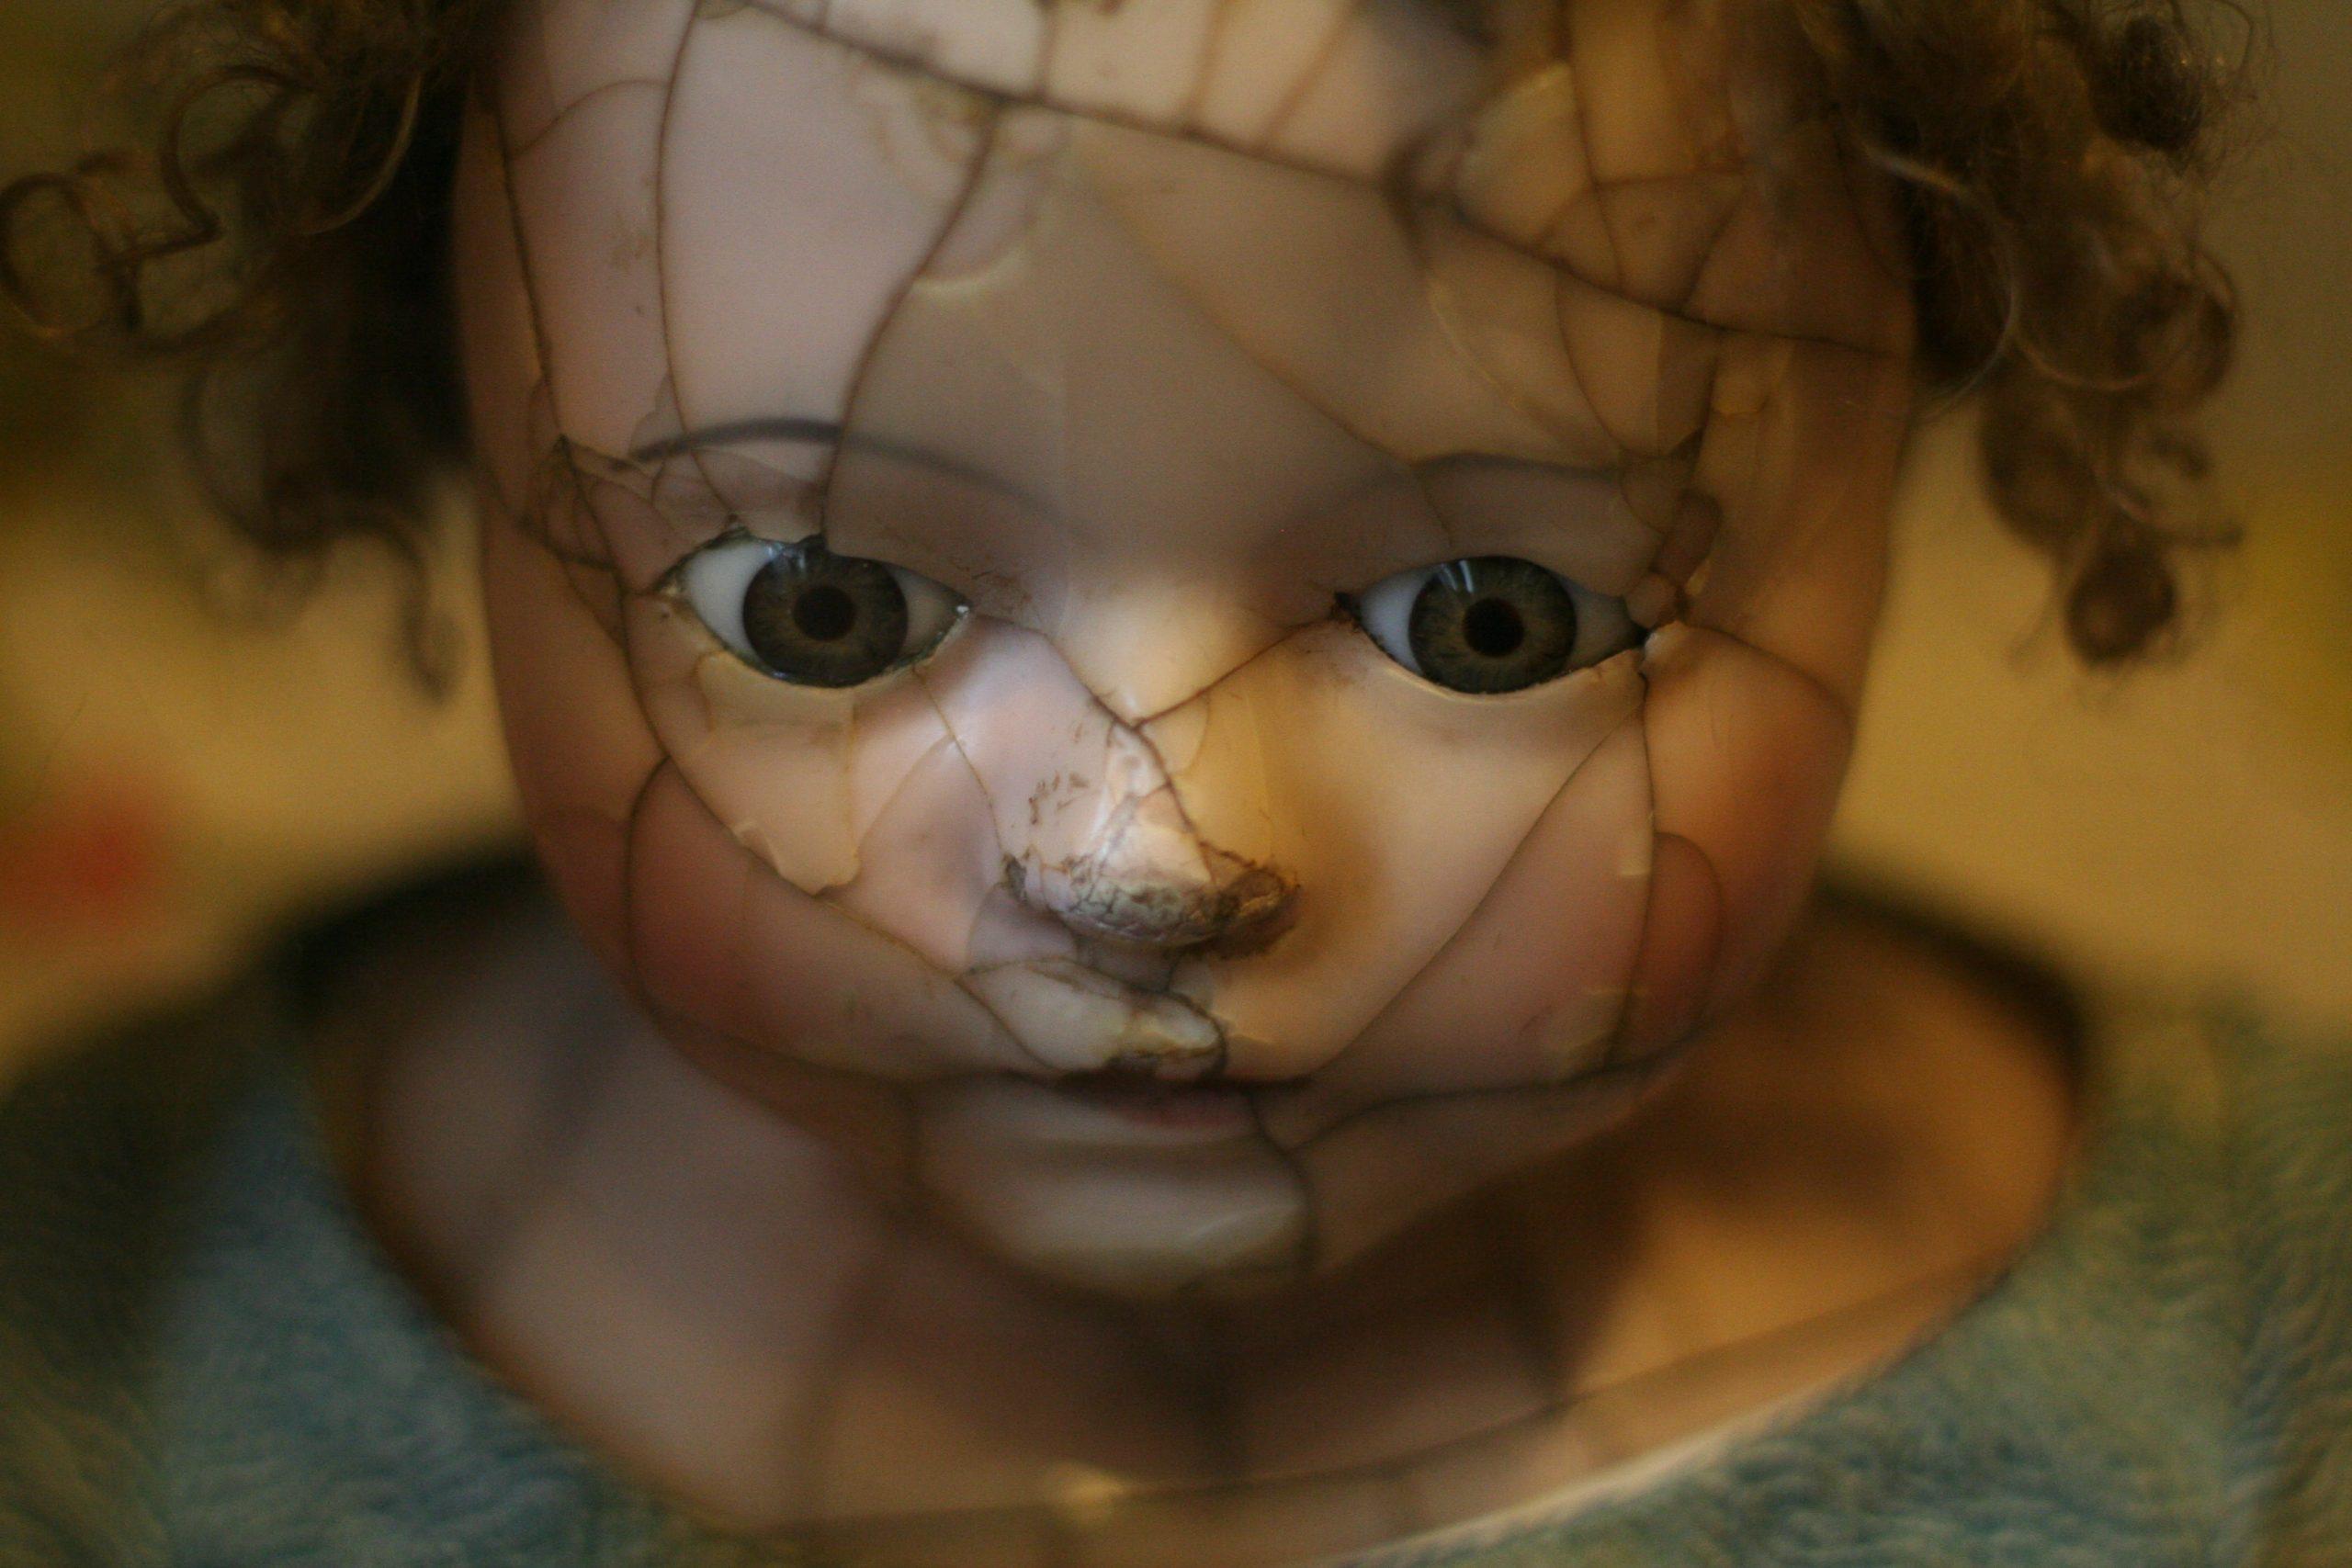 Creepy Doll